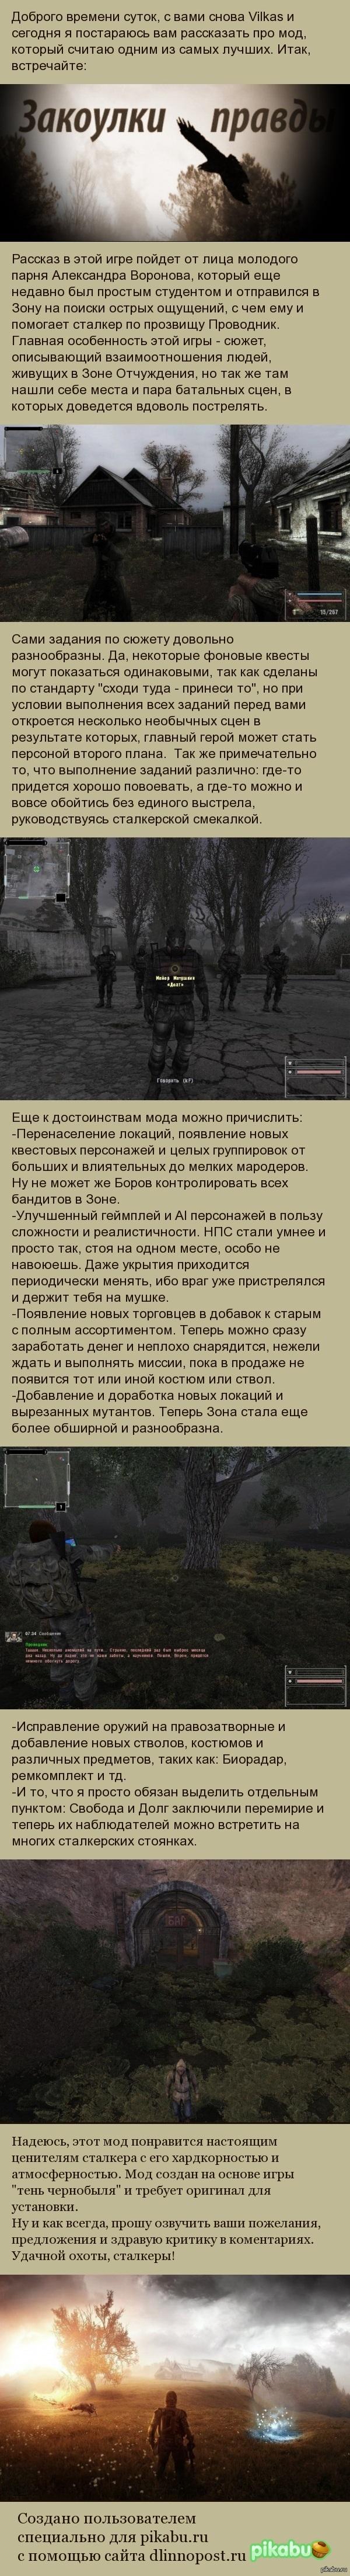 "S.T.A.L.K.E.R. мод - Закоулки правды. Предыдущий пост - <a href=""http://pikabu.ru/story/stalker_mod__prostranstvennaya_anomaliya_3336956"">http://pikabu.ru/story/_3336956</a>"